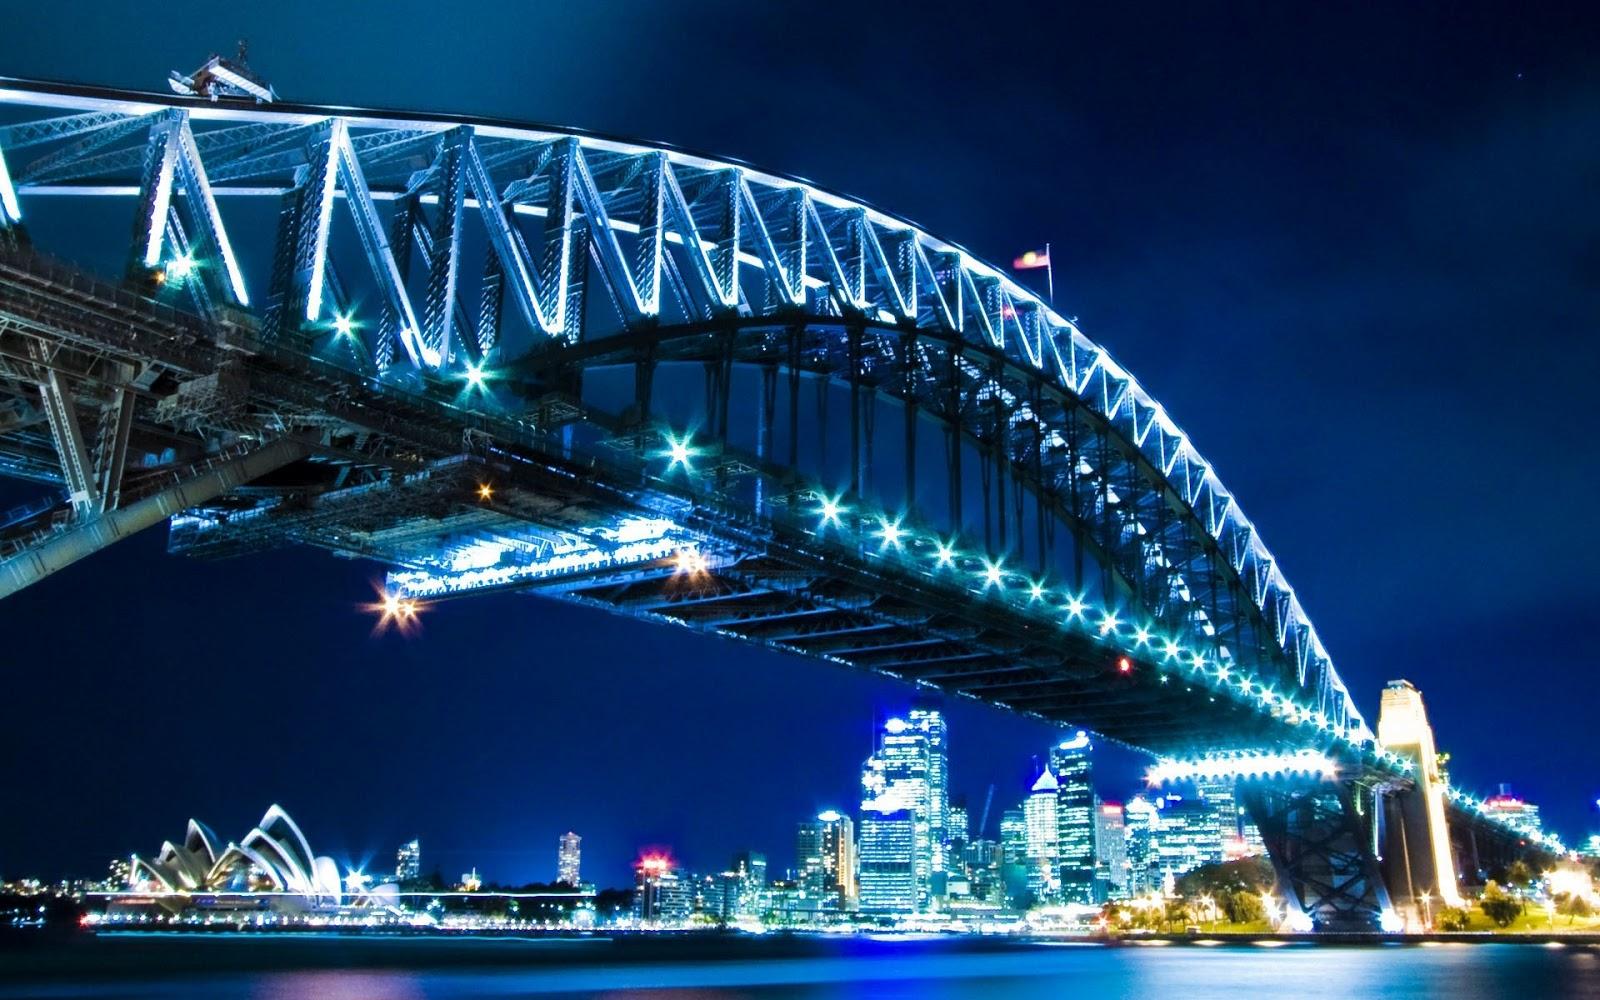 Cute Iphone 5c Wallpapers Cool Photos Sydney Harbour Bridge Australia